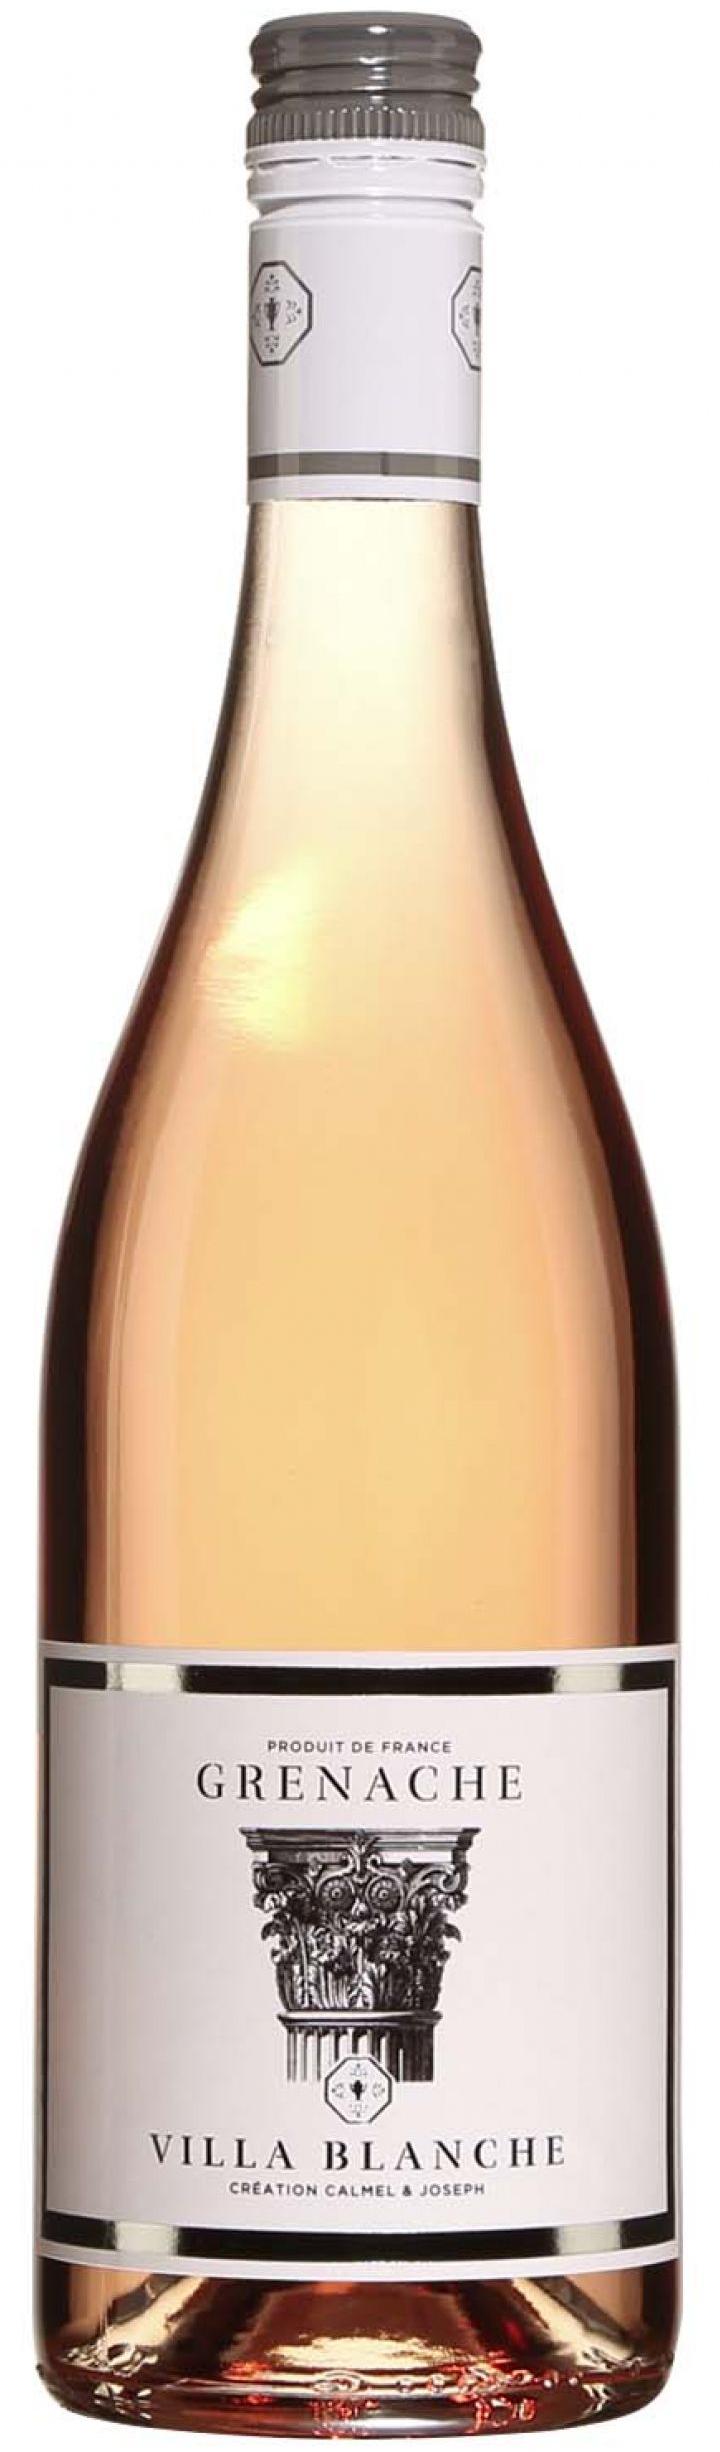 Calmel & Joseph, Villa Blanche – Grenache Rosé